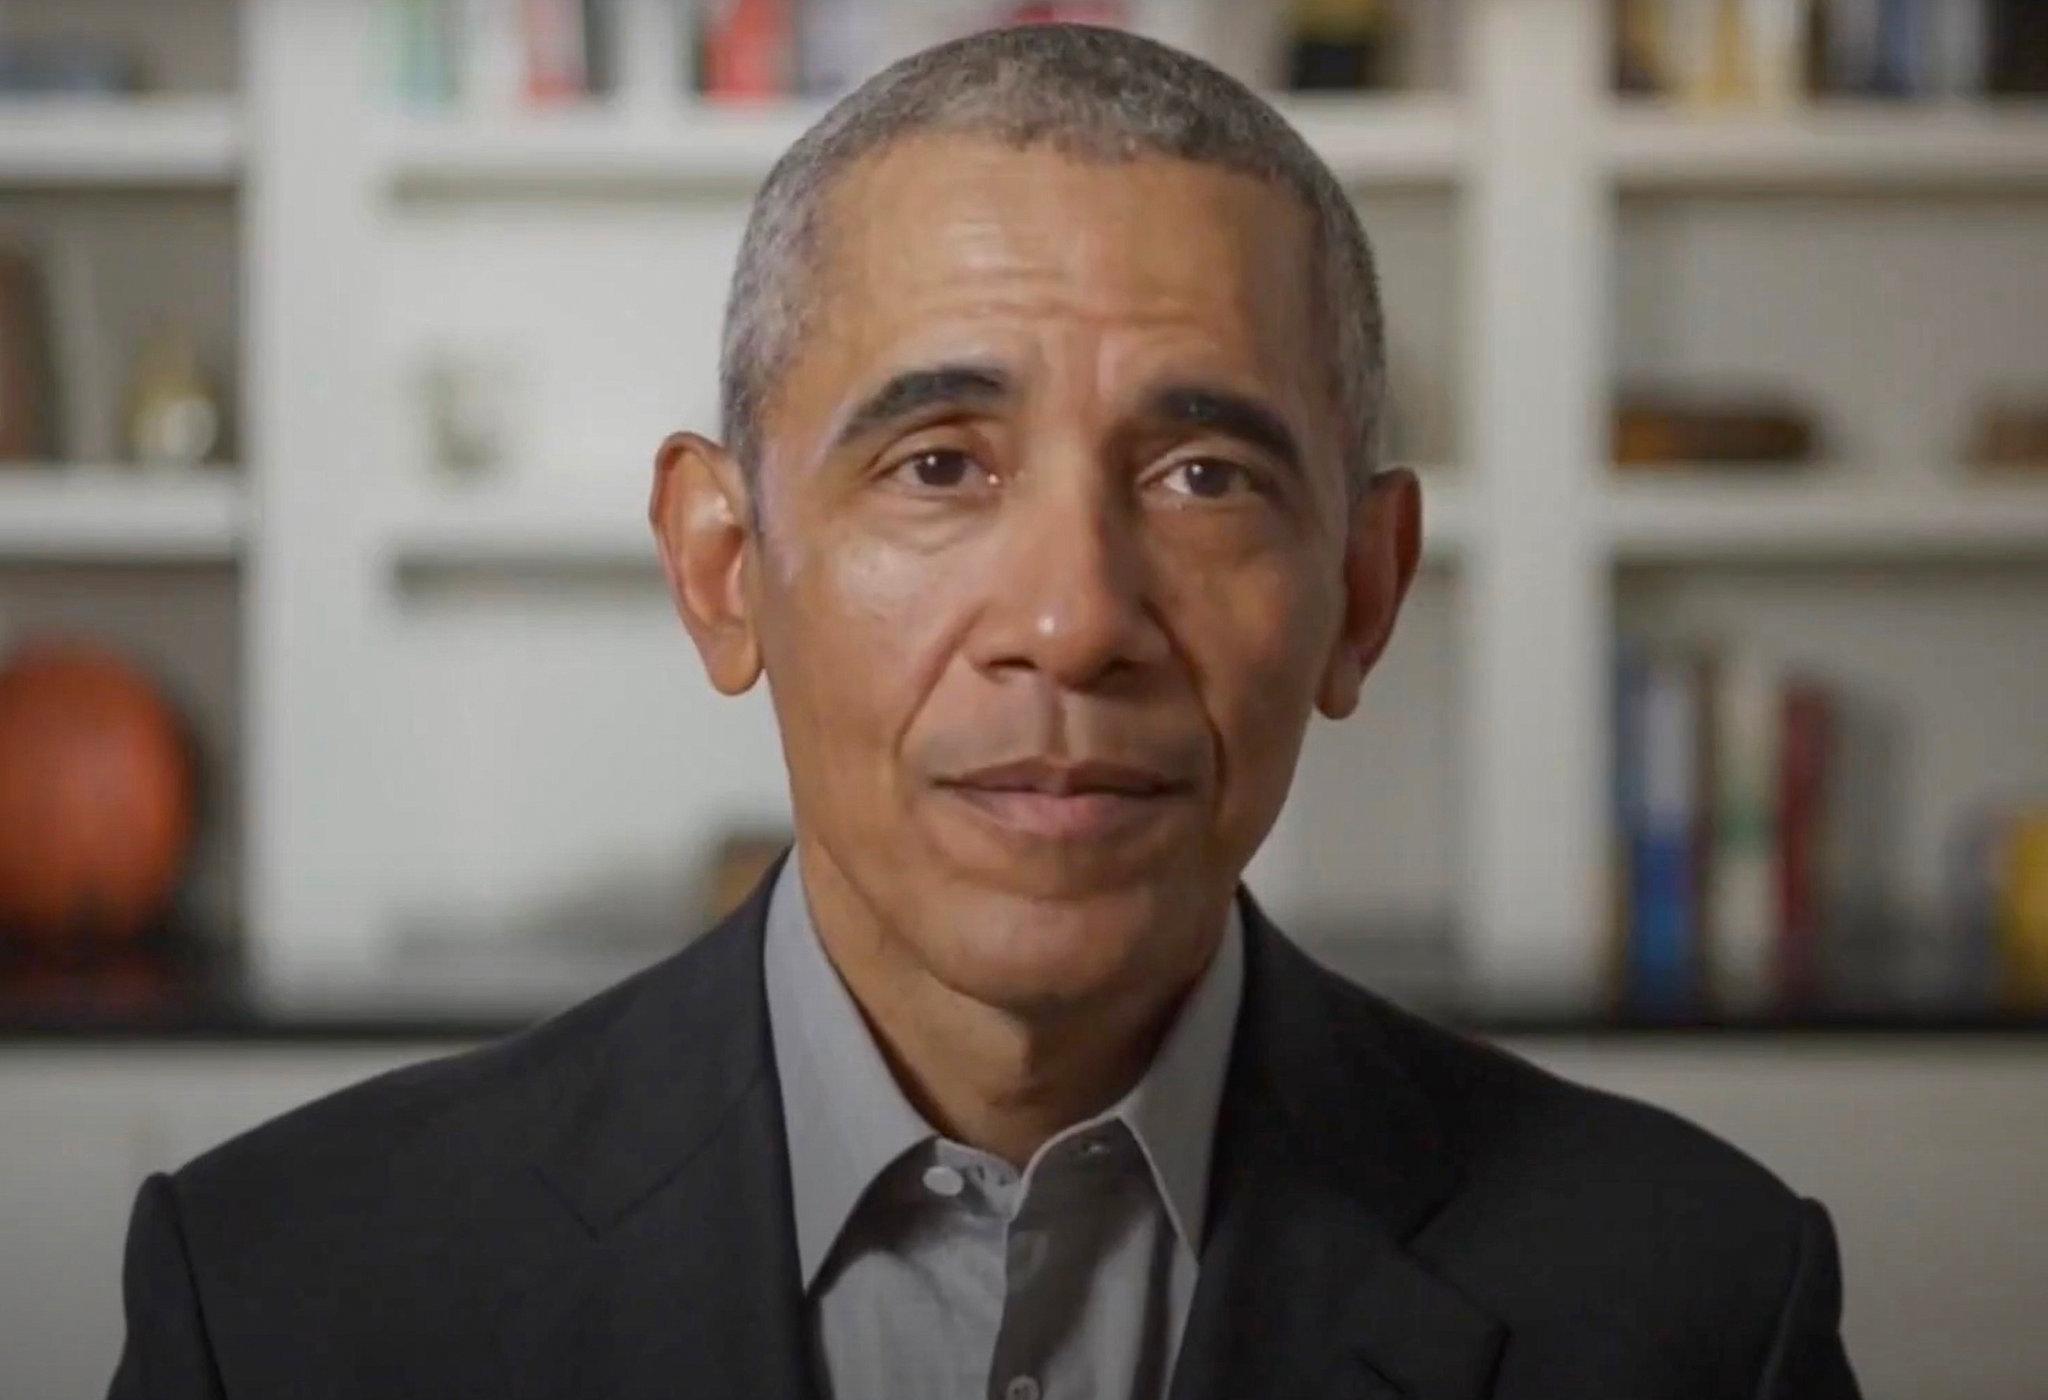 Obama Commencement Speech of 2020 High School Graduates